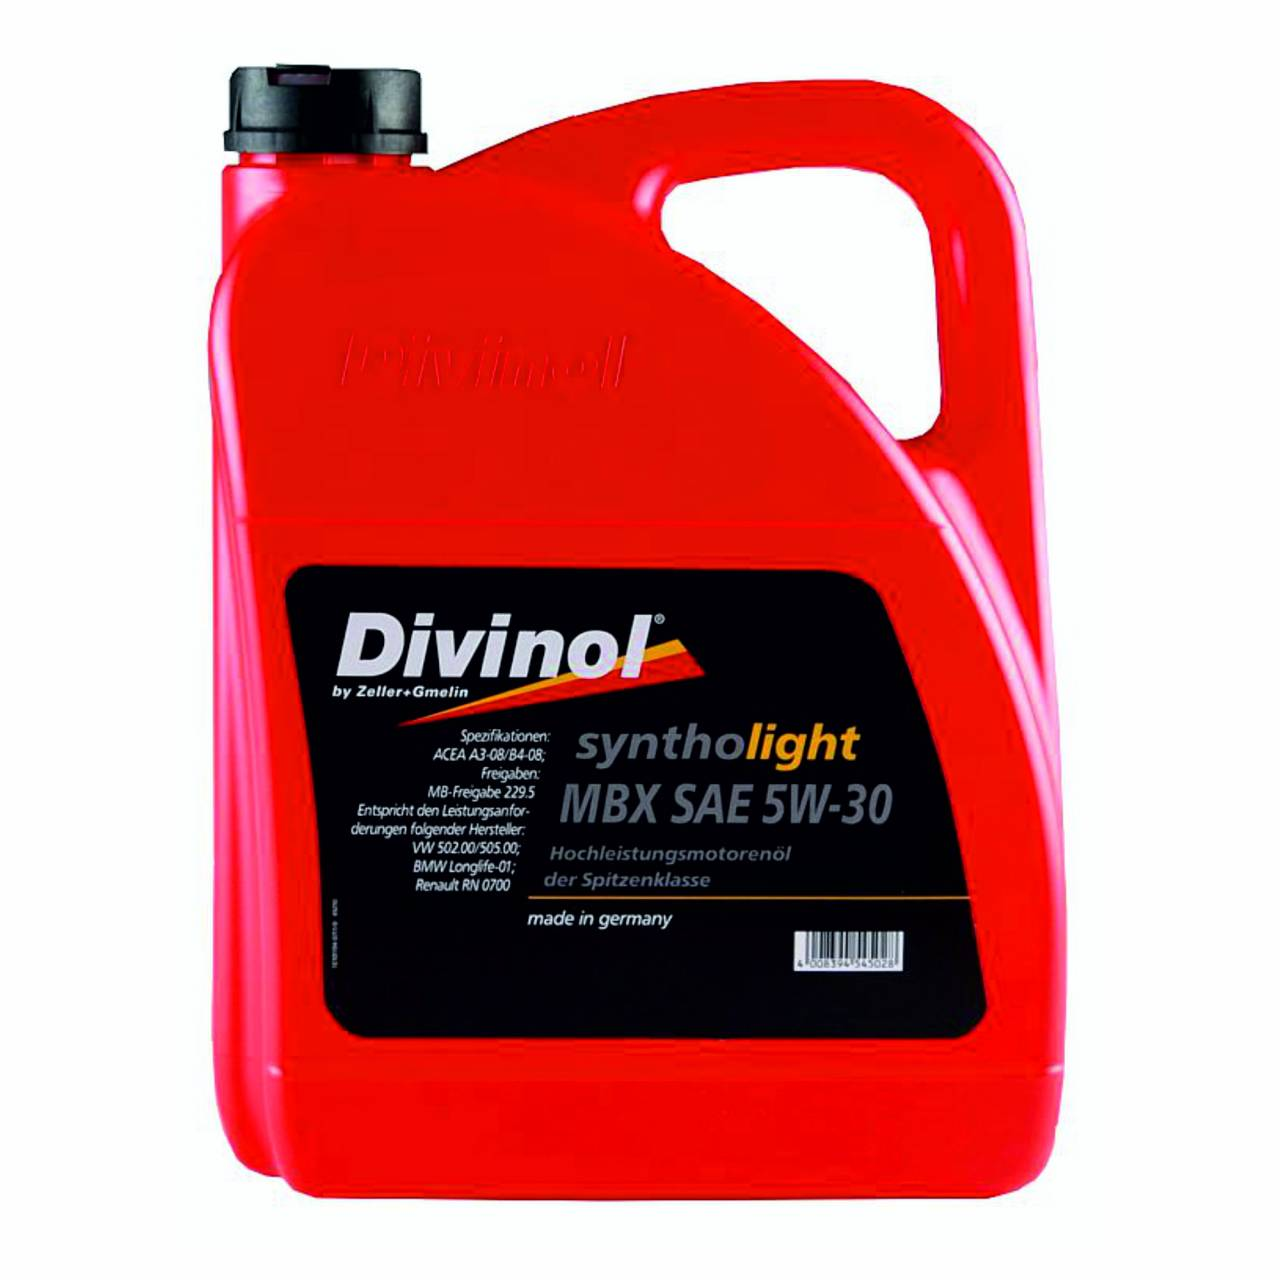 Motorenöl 'Divinol' Syntholight MBX 5W-30 / 5,0 Liter Kanister